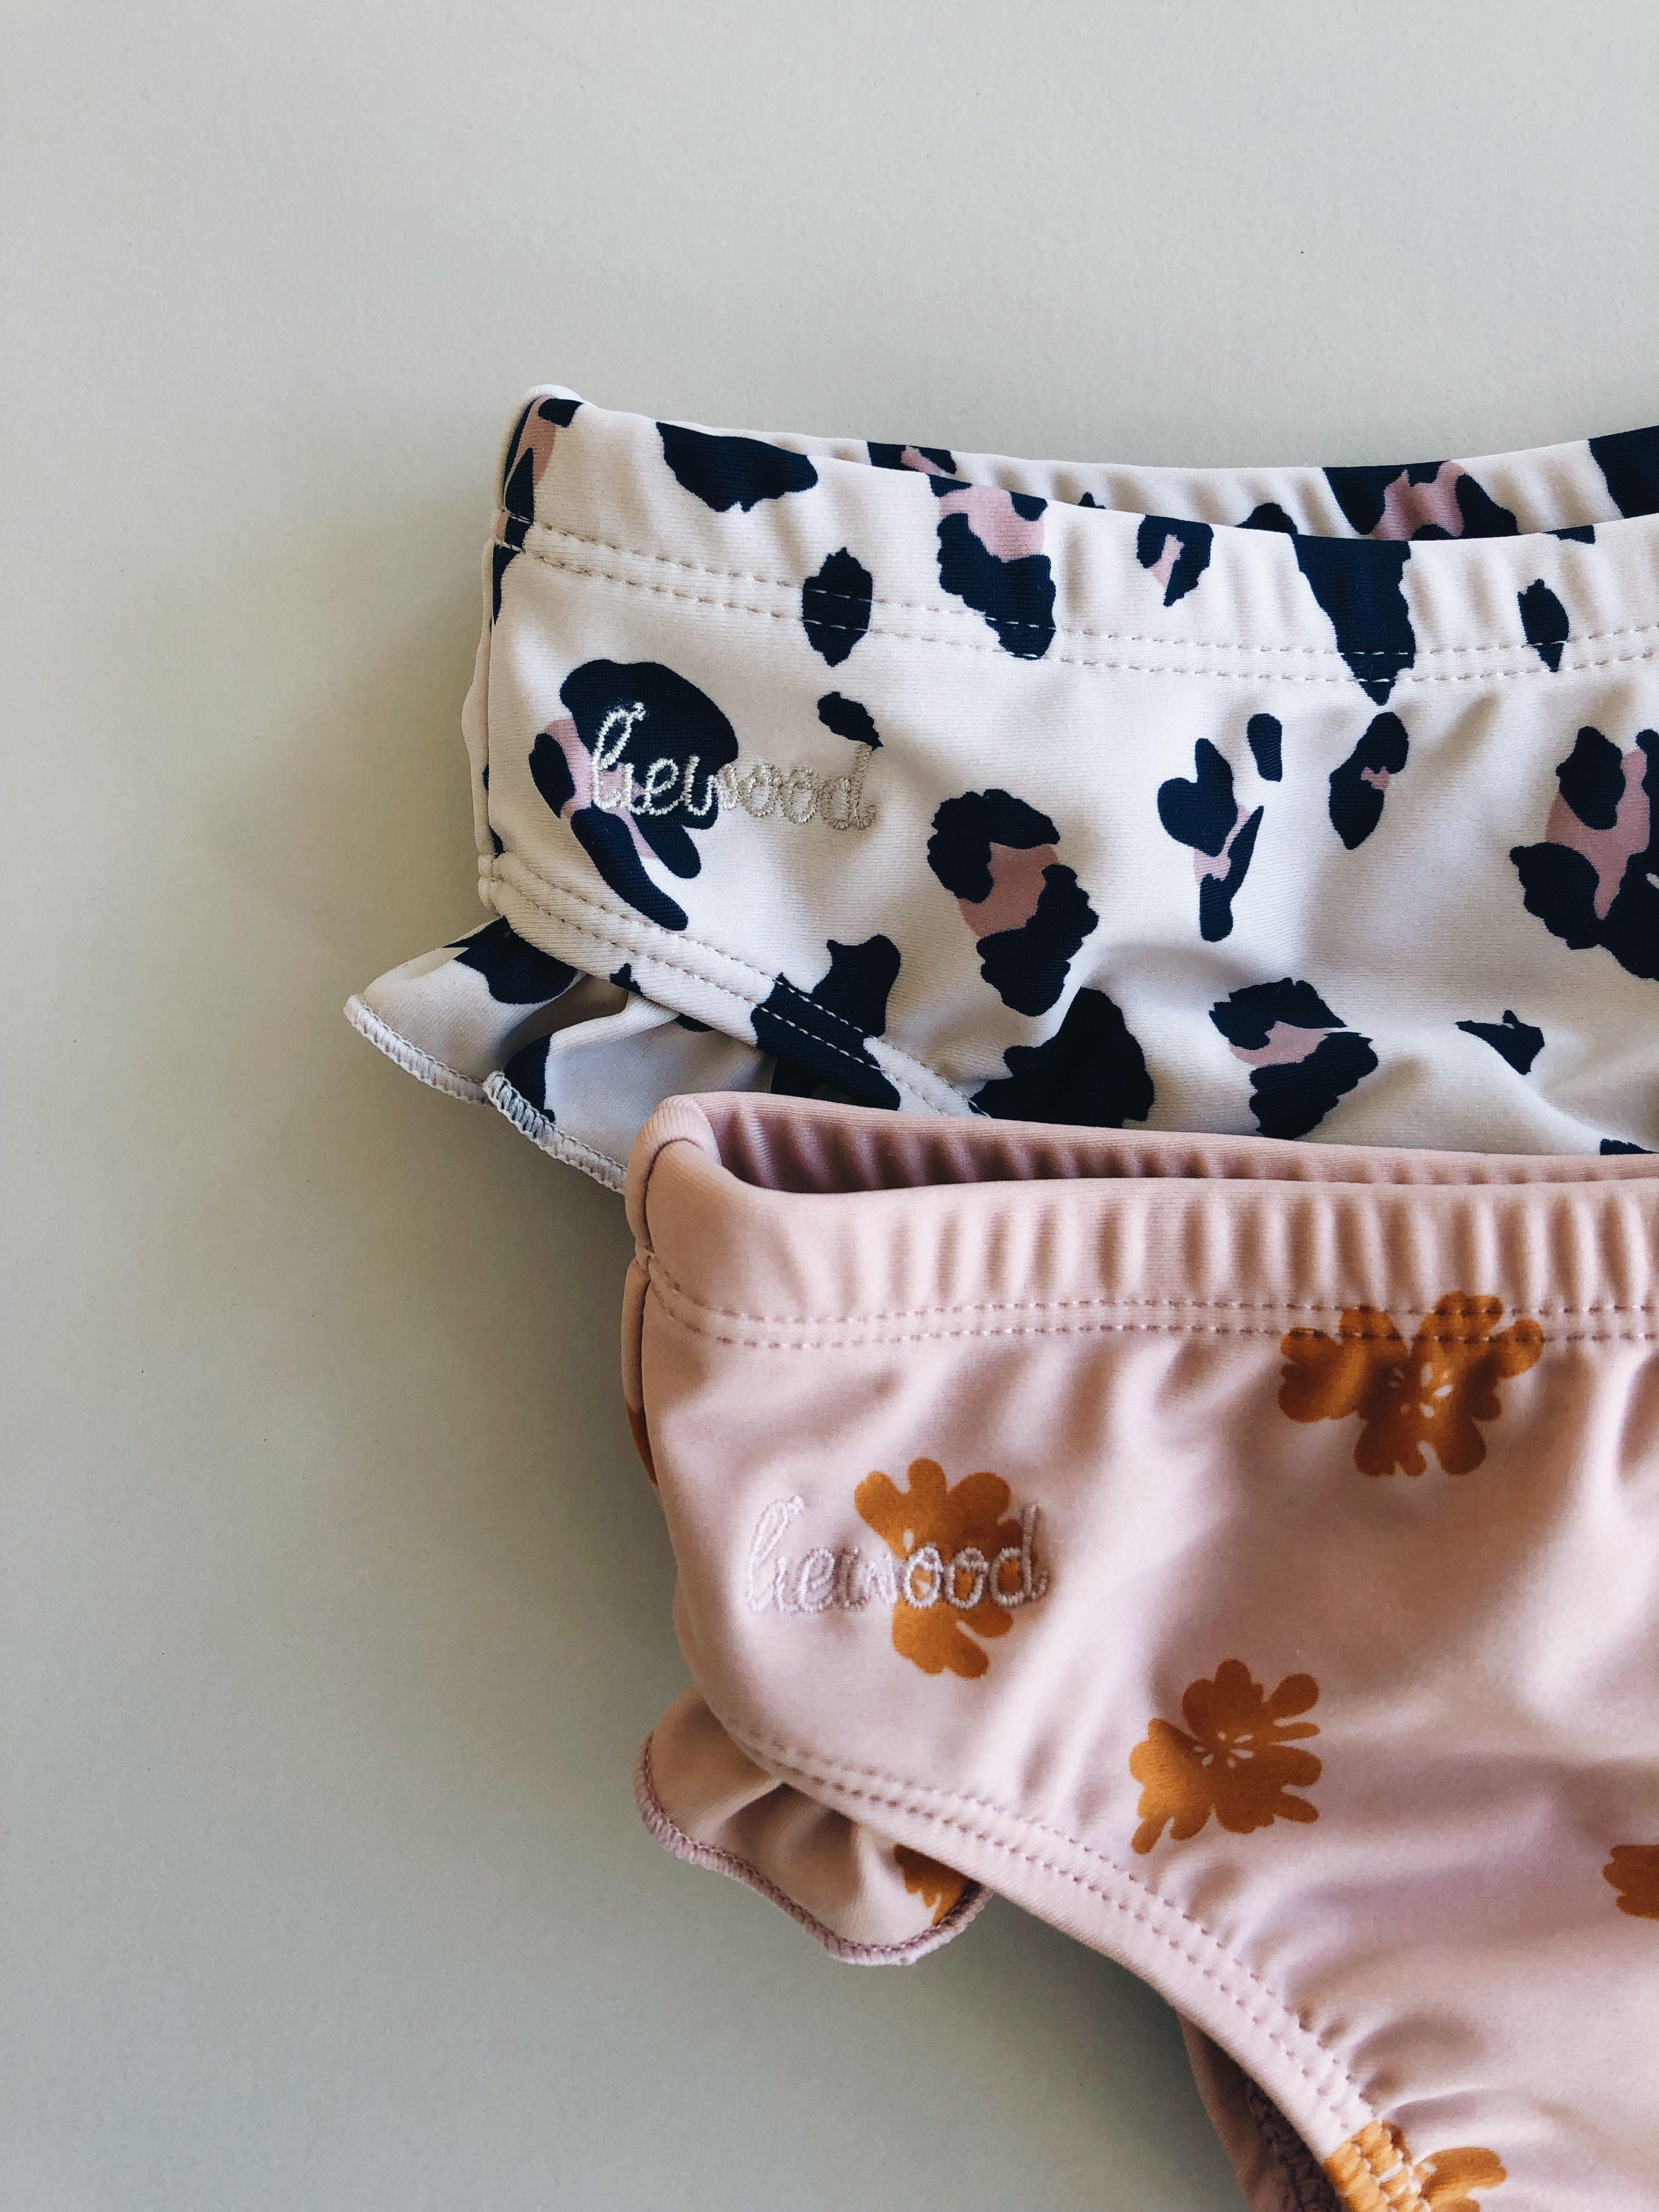 c074bb32a5 Cute beach wear for the baby girls from Liewood. | Kids swimwear ...